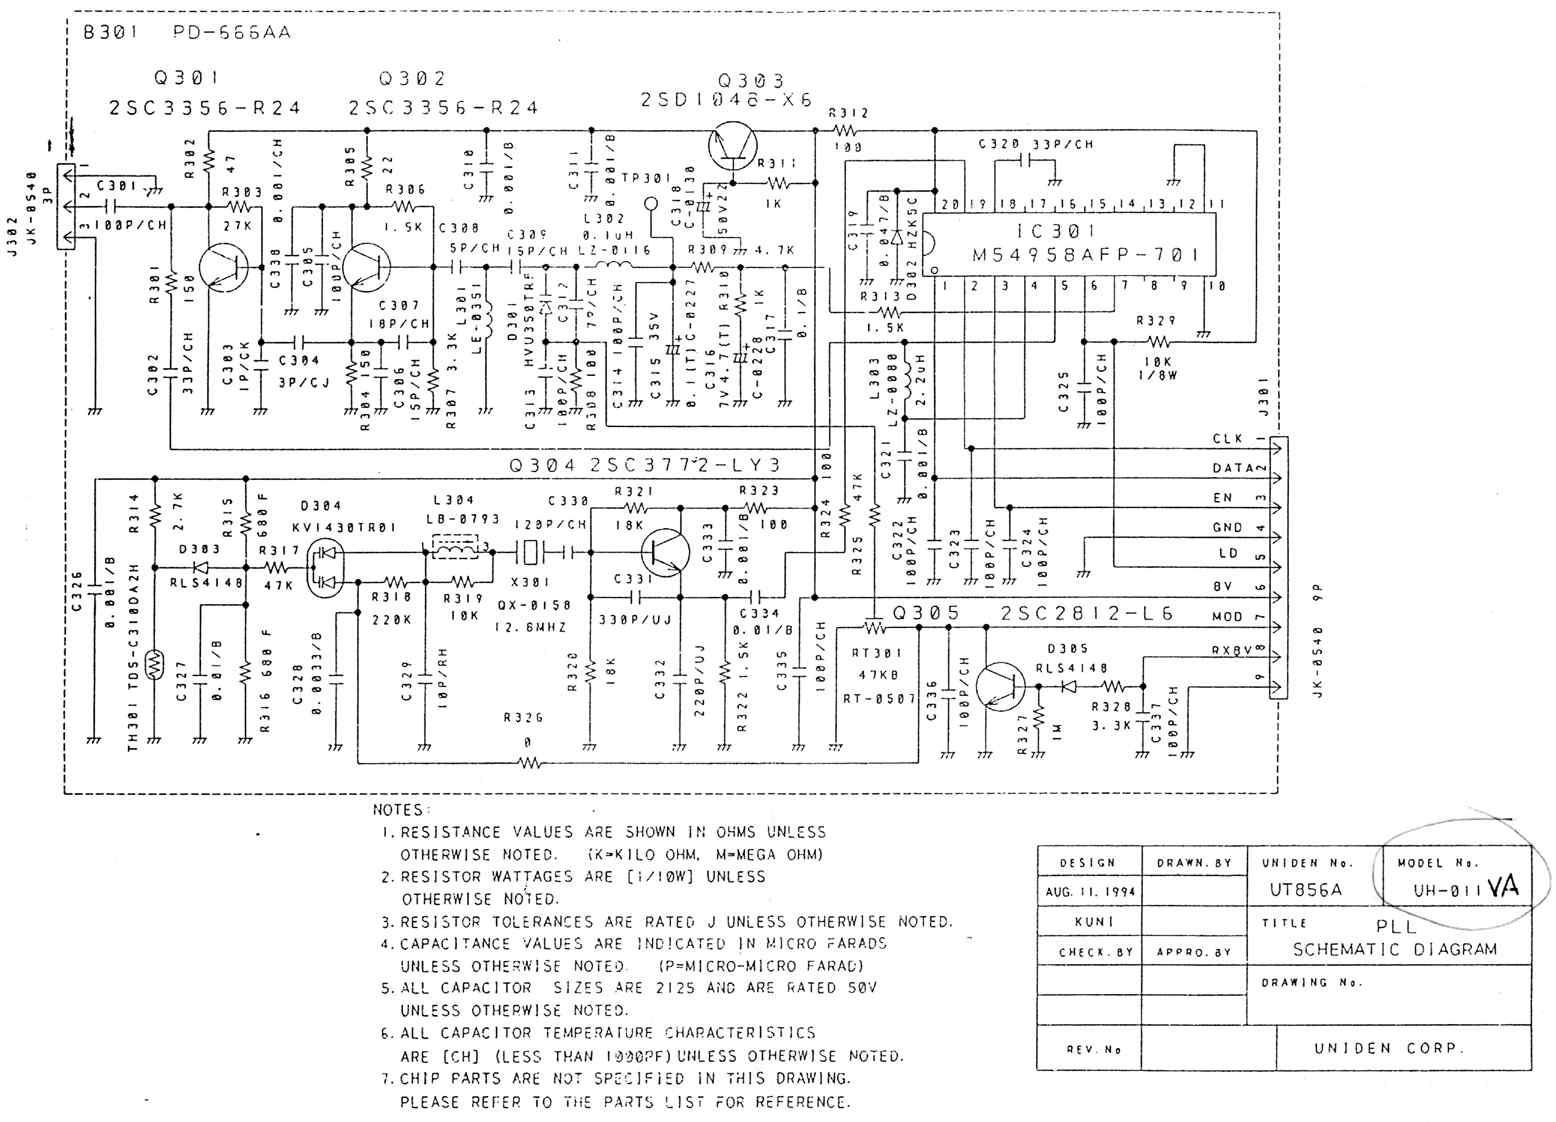 uniden uh-011 scan mod